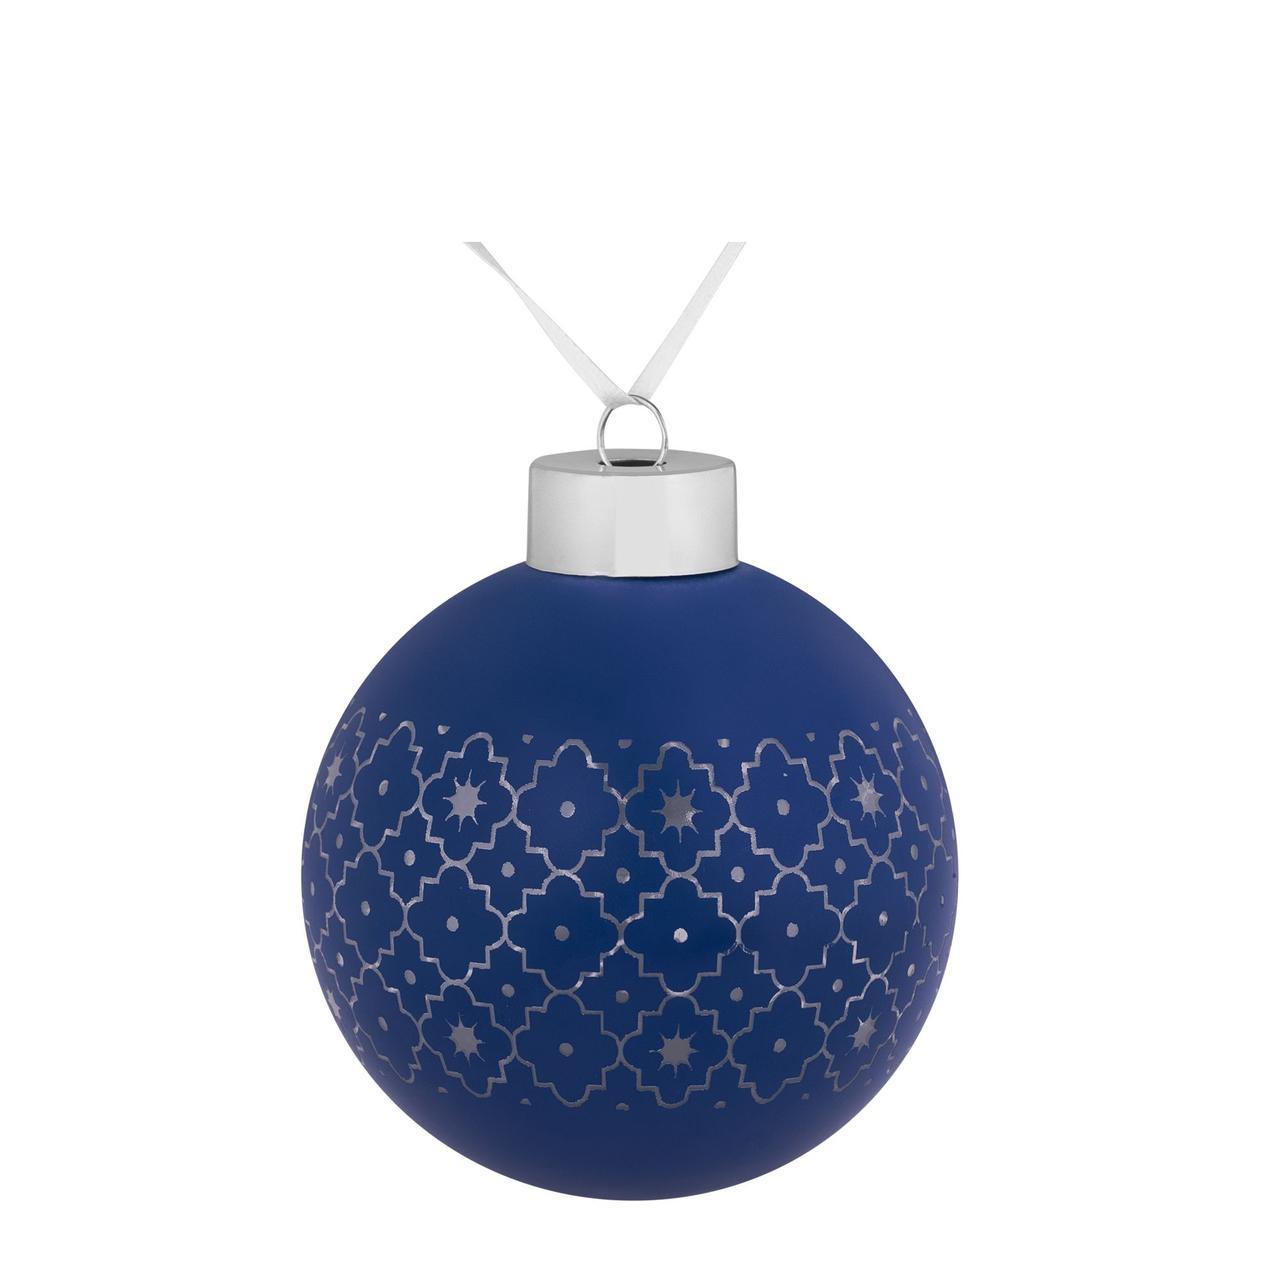 Елочный шар Chain, 8 см, синий (артикул 7169.40)